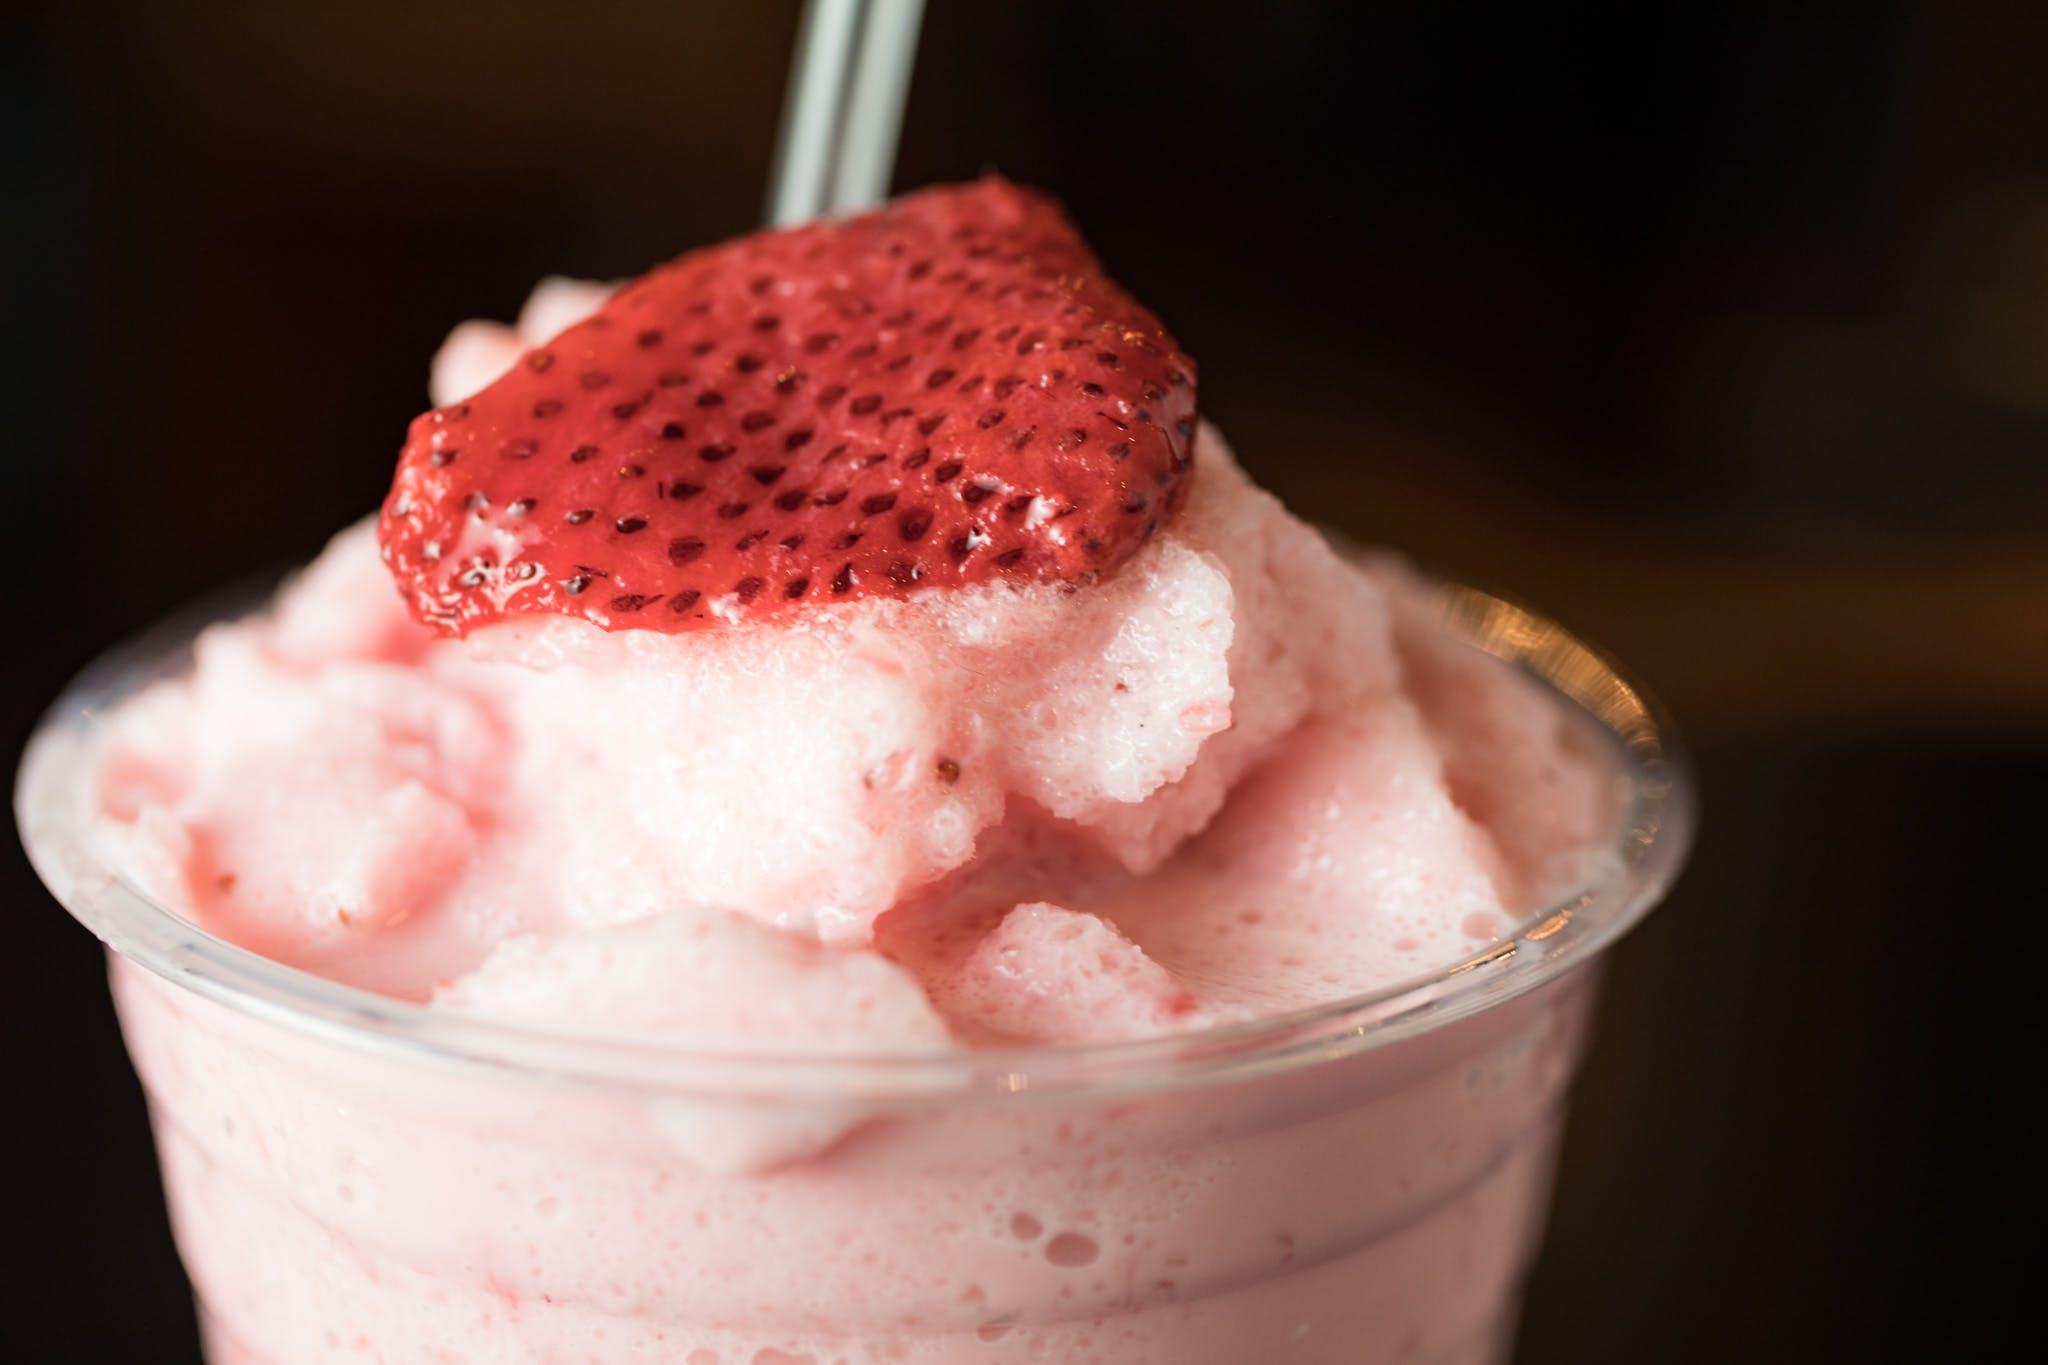 Strawberry Milkshake from Judy's Kitchen in New Brunswick, NJ